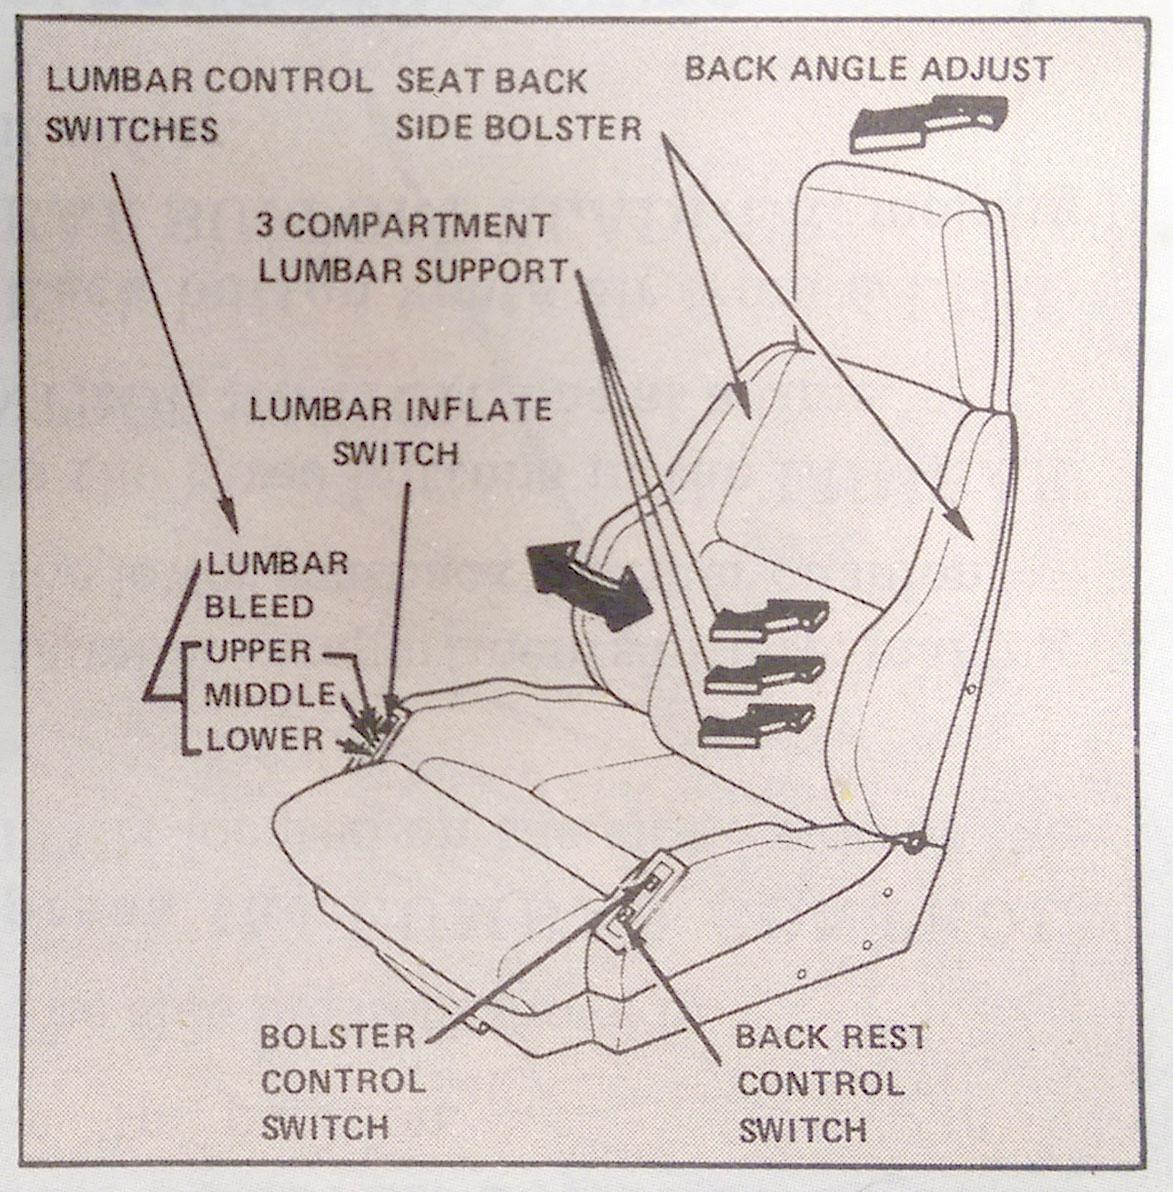 1985 corvette wiring diagram mitsubishi radio power seat back bolster lumbar issues